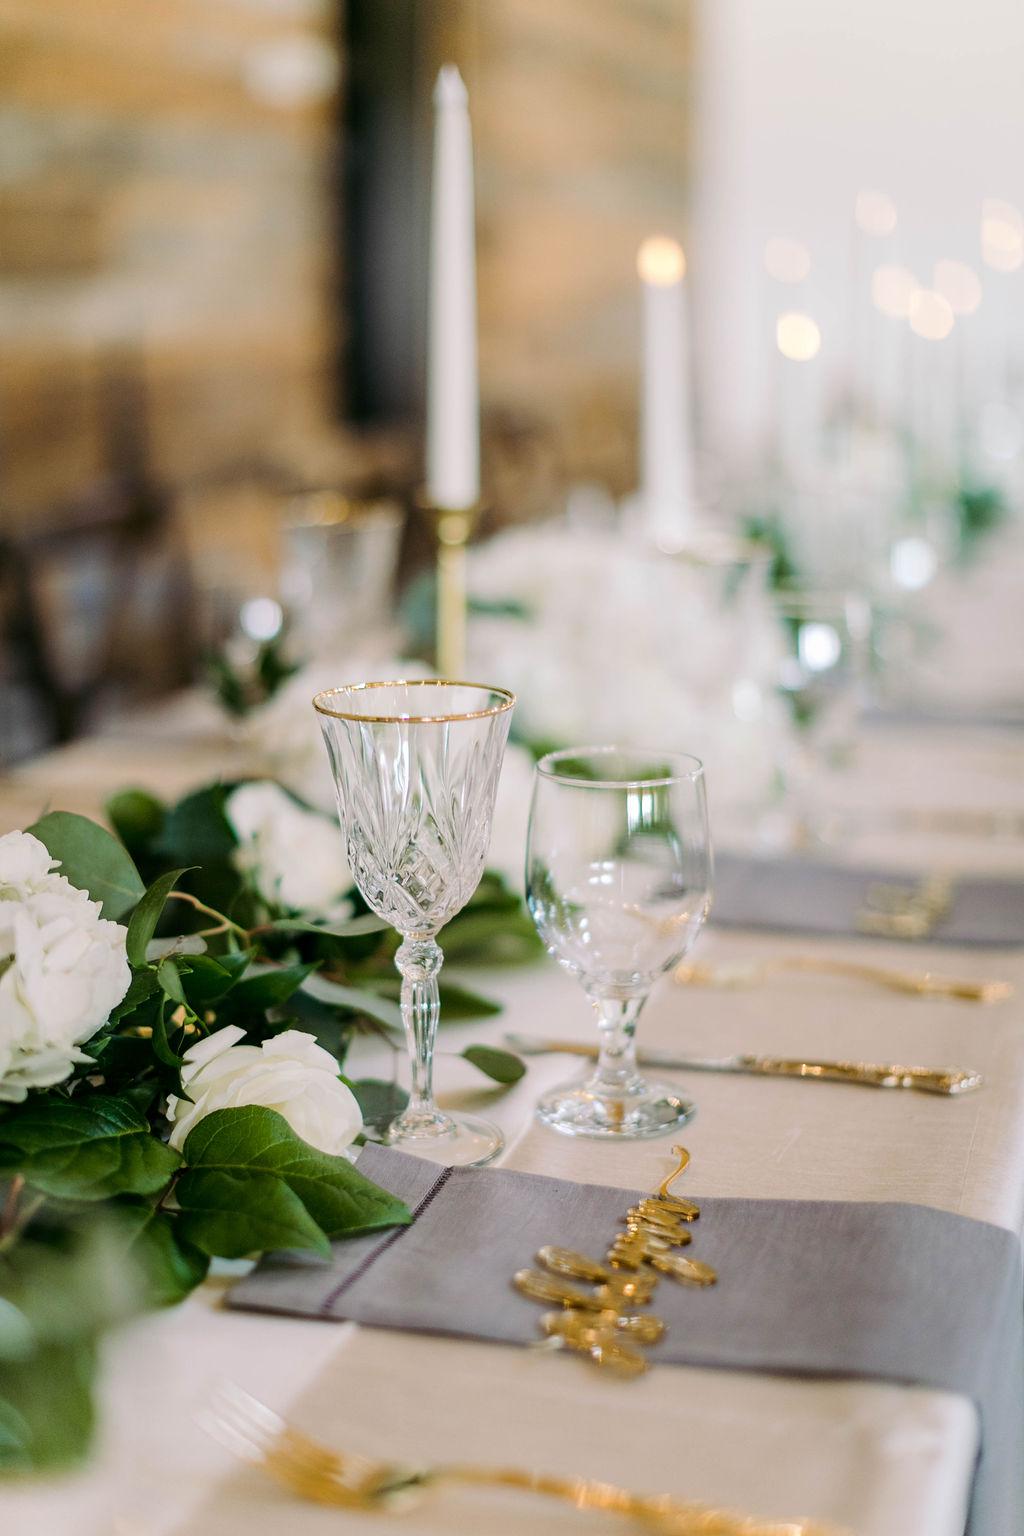 Head Table Setting | Napkin Place Settings | Austin Wedding Planner